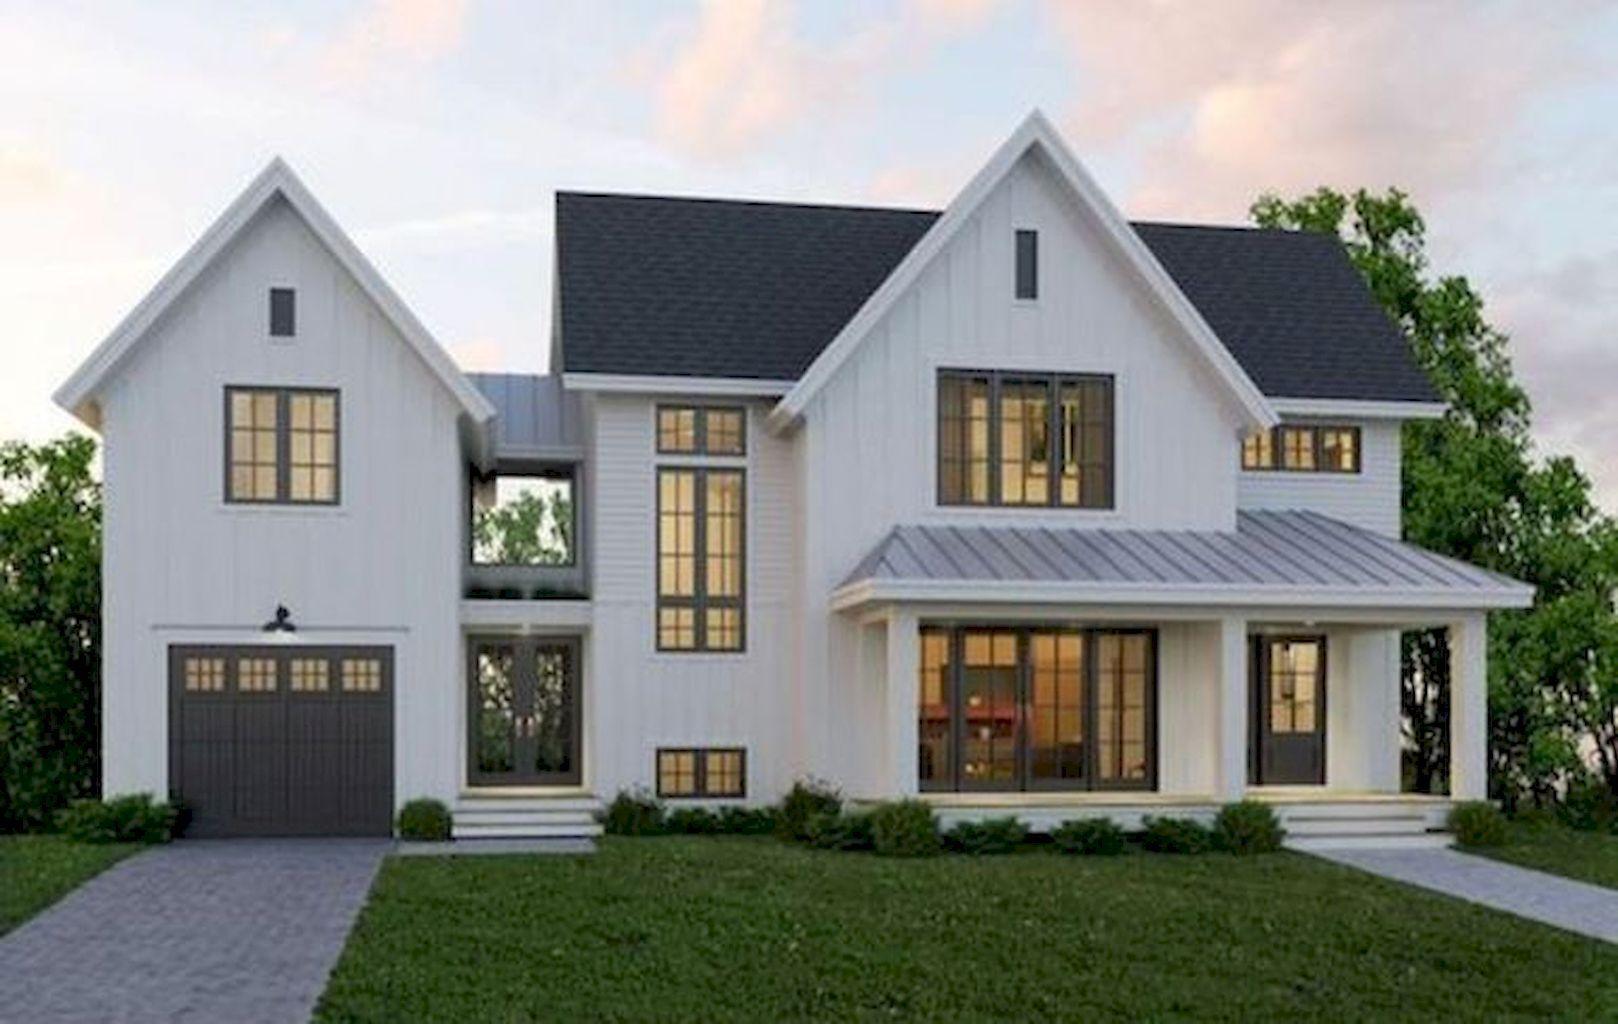 70 Awesome Modern Farmhouse Exterior Design Ideas - Insidexterior